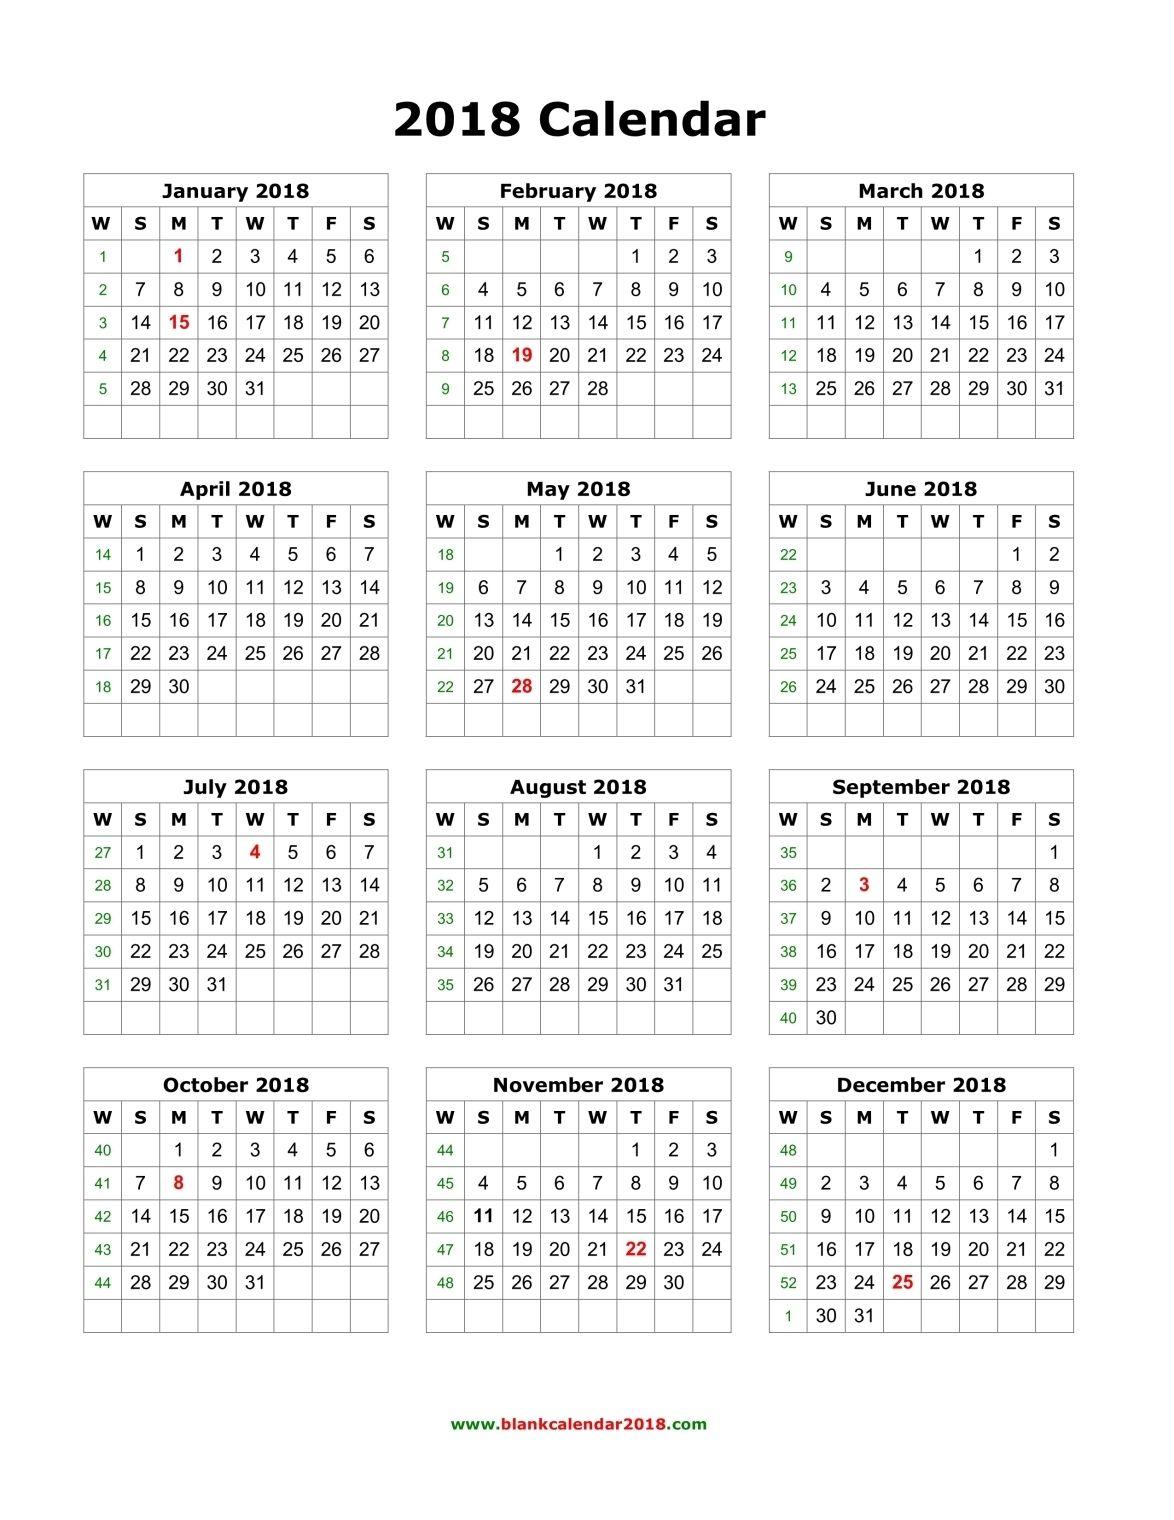 October 2018 Calendar Holidays Twice | Calendar | Pinterest ...